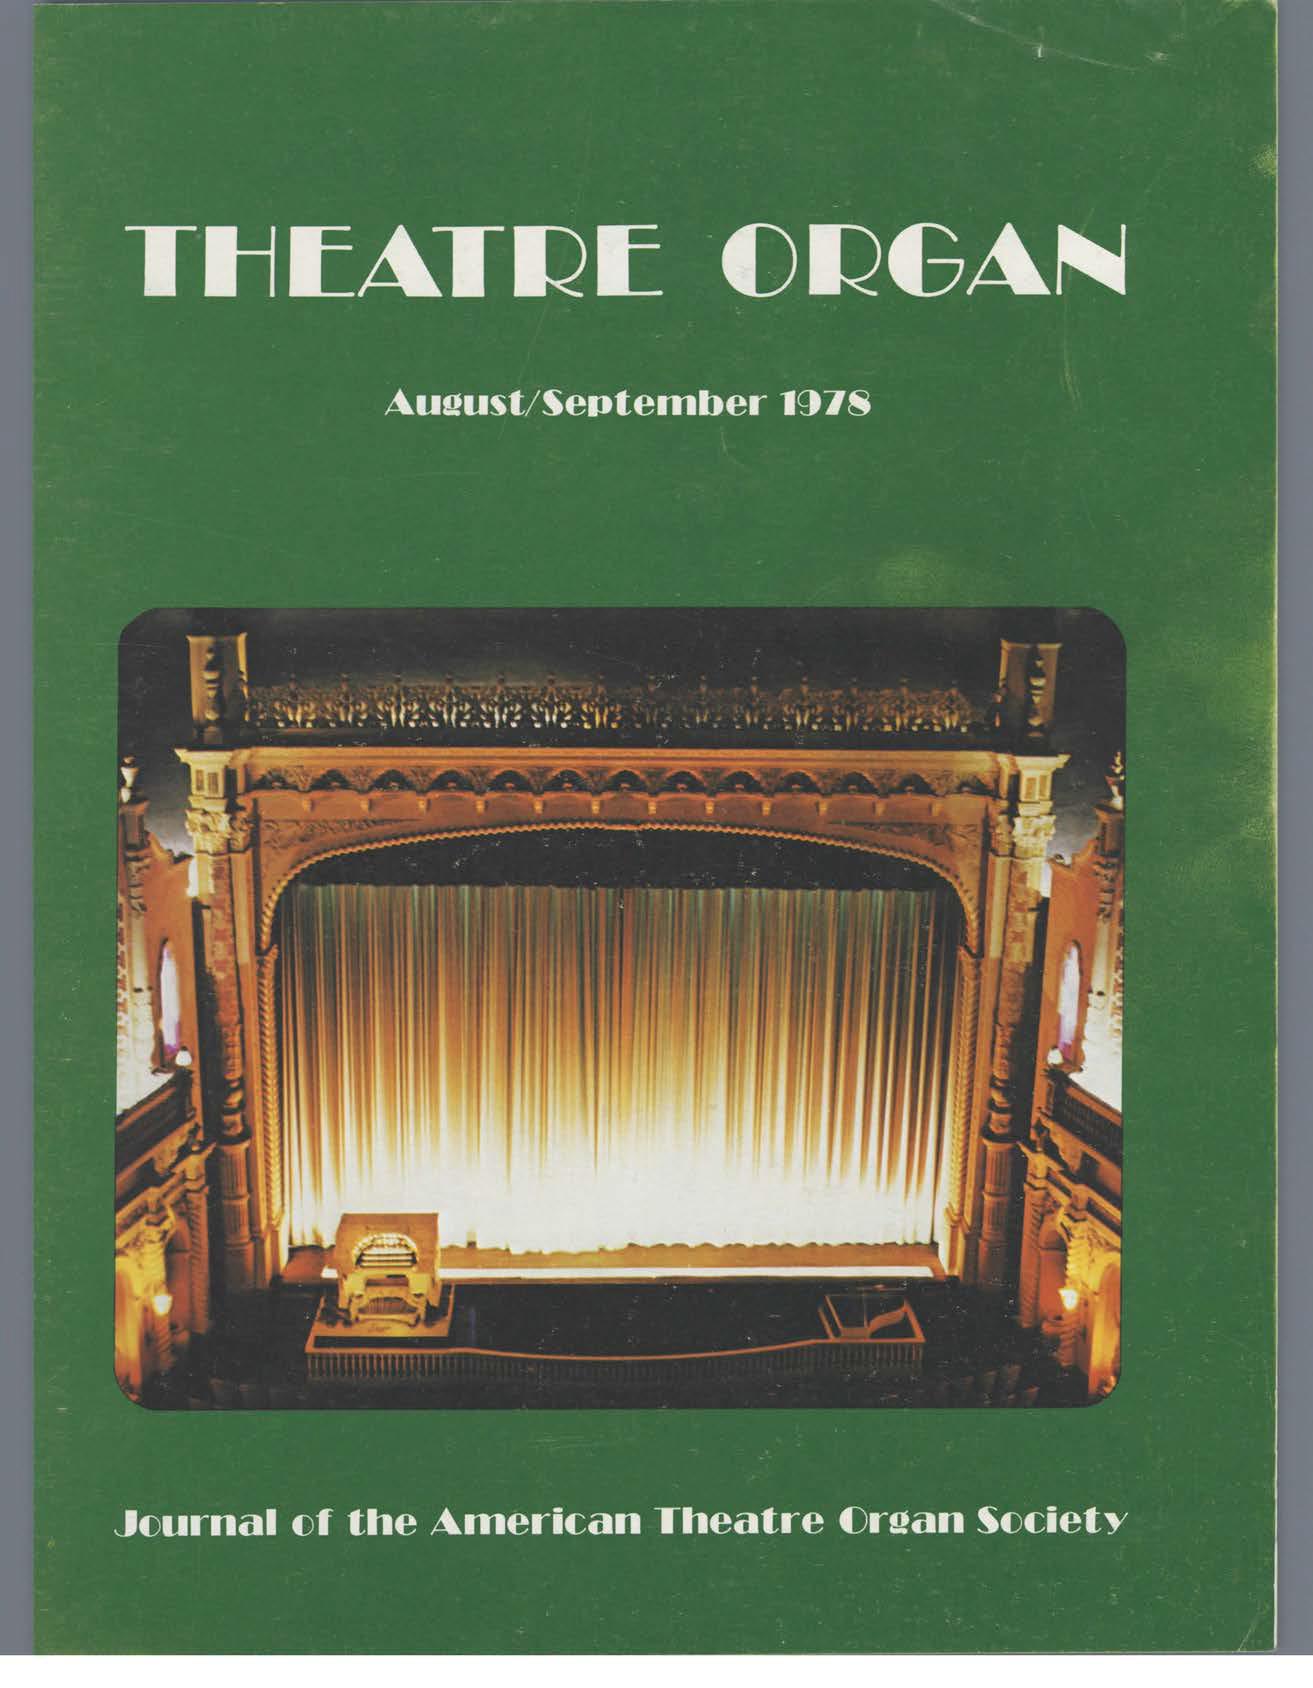 Theatre Organ, August - September 1978, Volume 20, Number 4